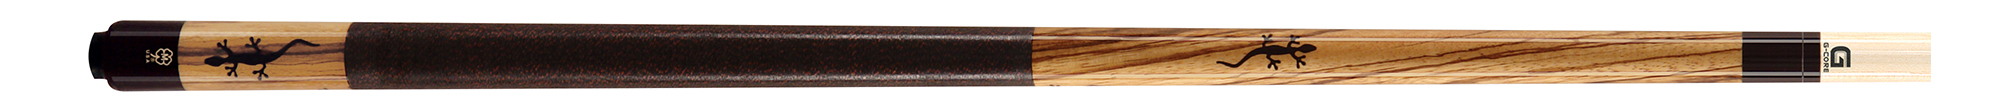 PK3069: McDermott M54A Zebrawood/inlay pool #1